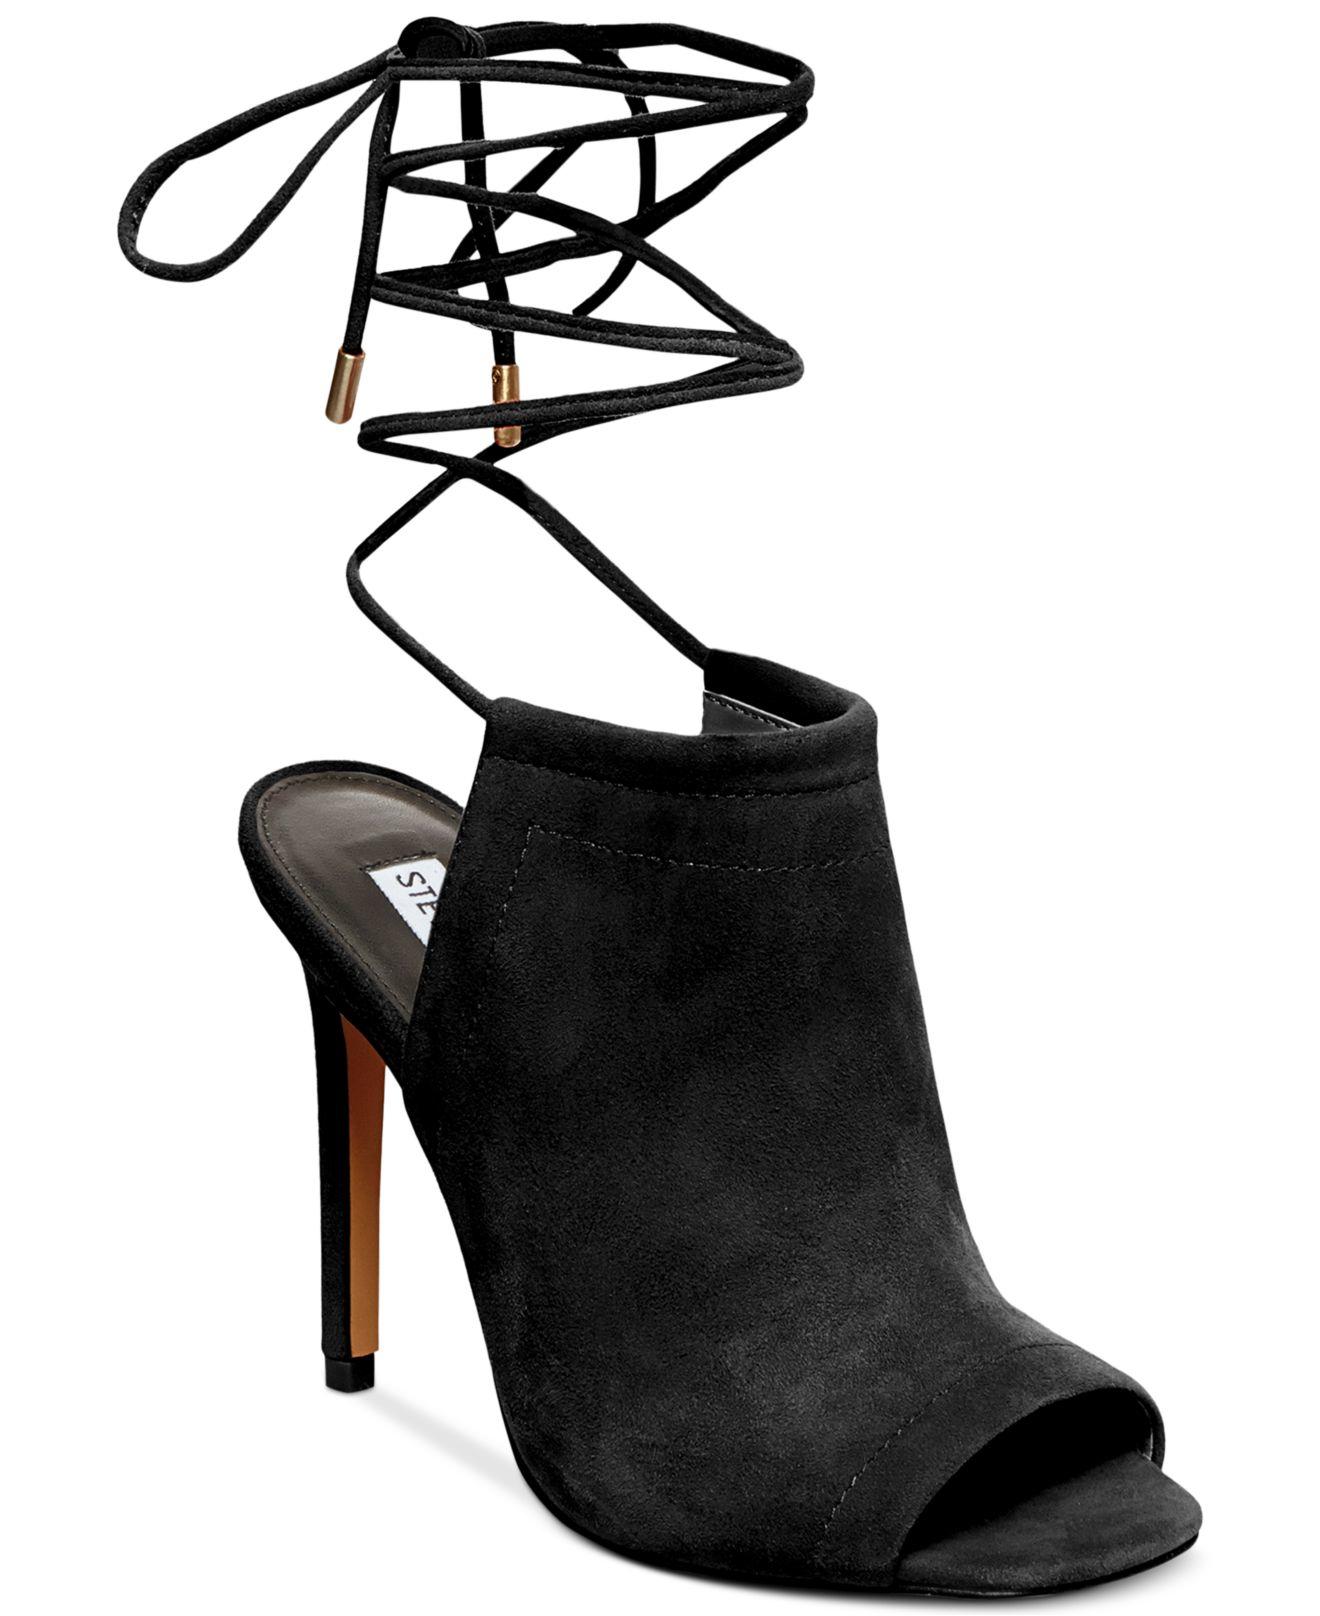 Lyst - Steve Madden Sophie Ankle Wrapped Sandals in Black